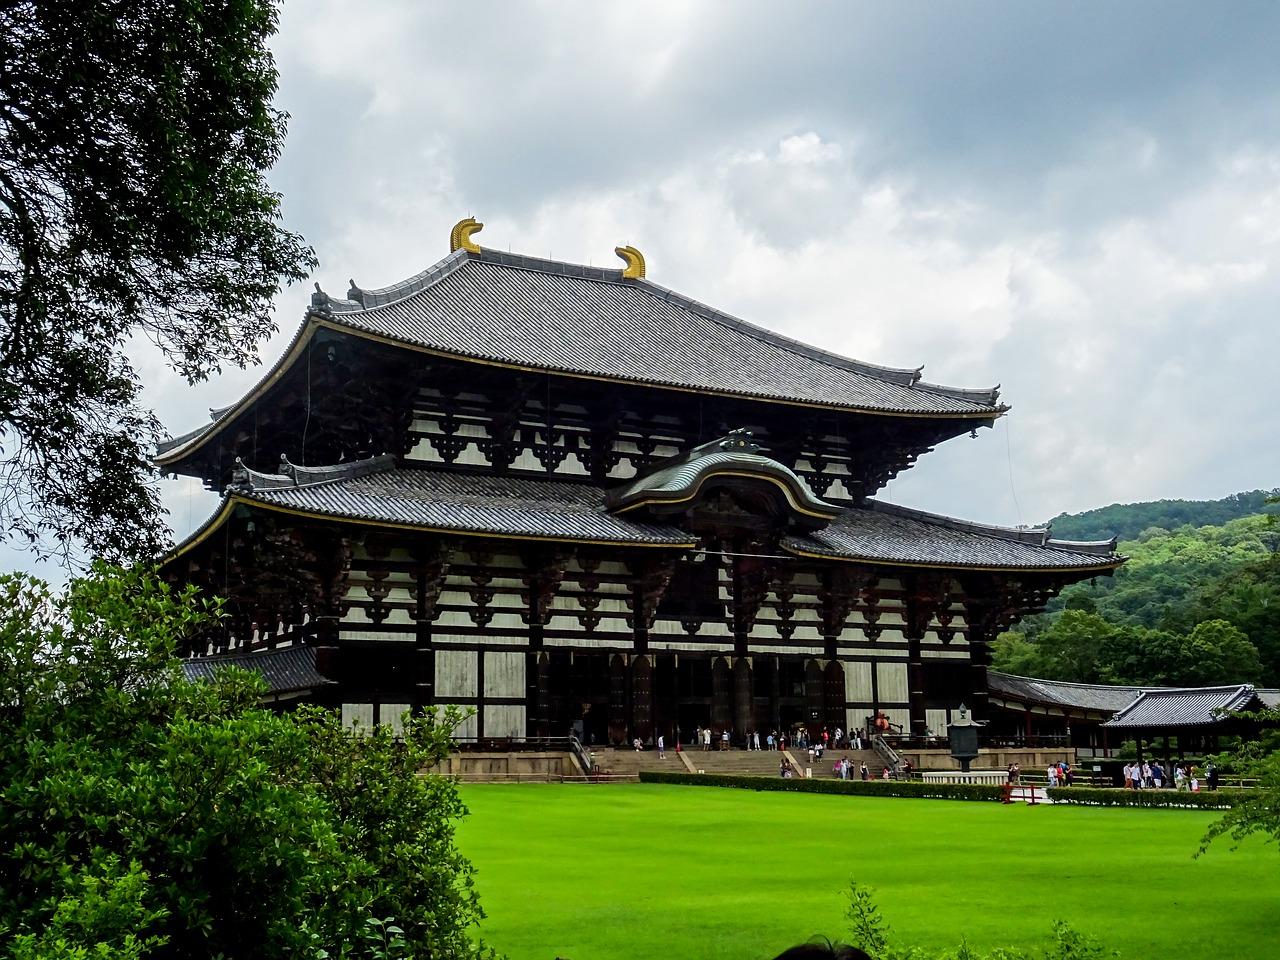 Todai Ji temple in Nara op Honshu